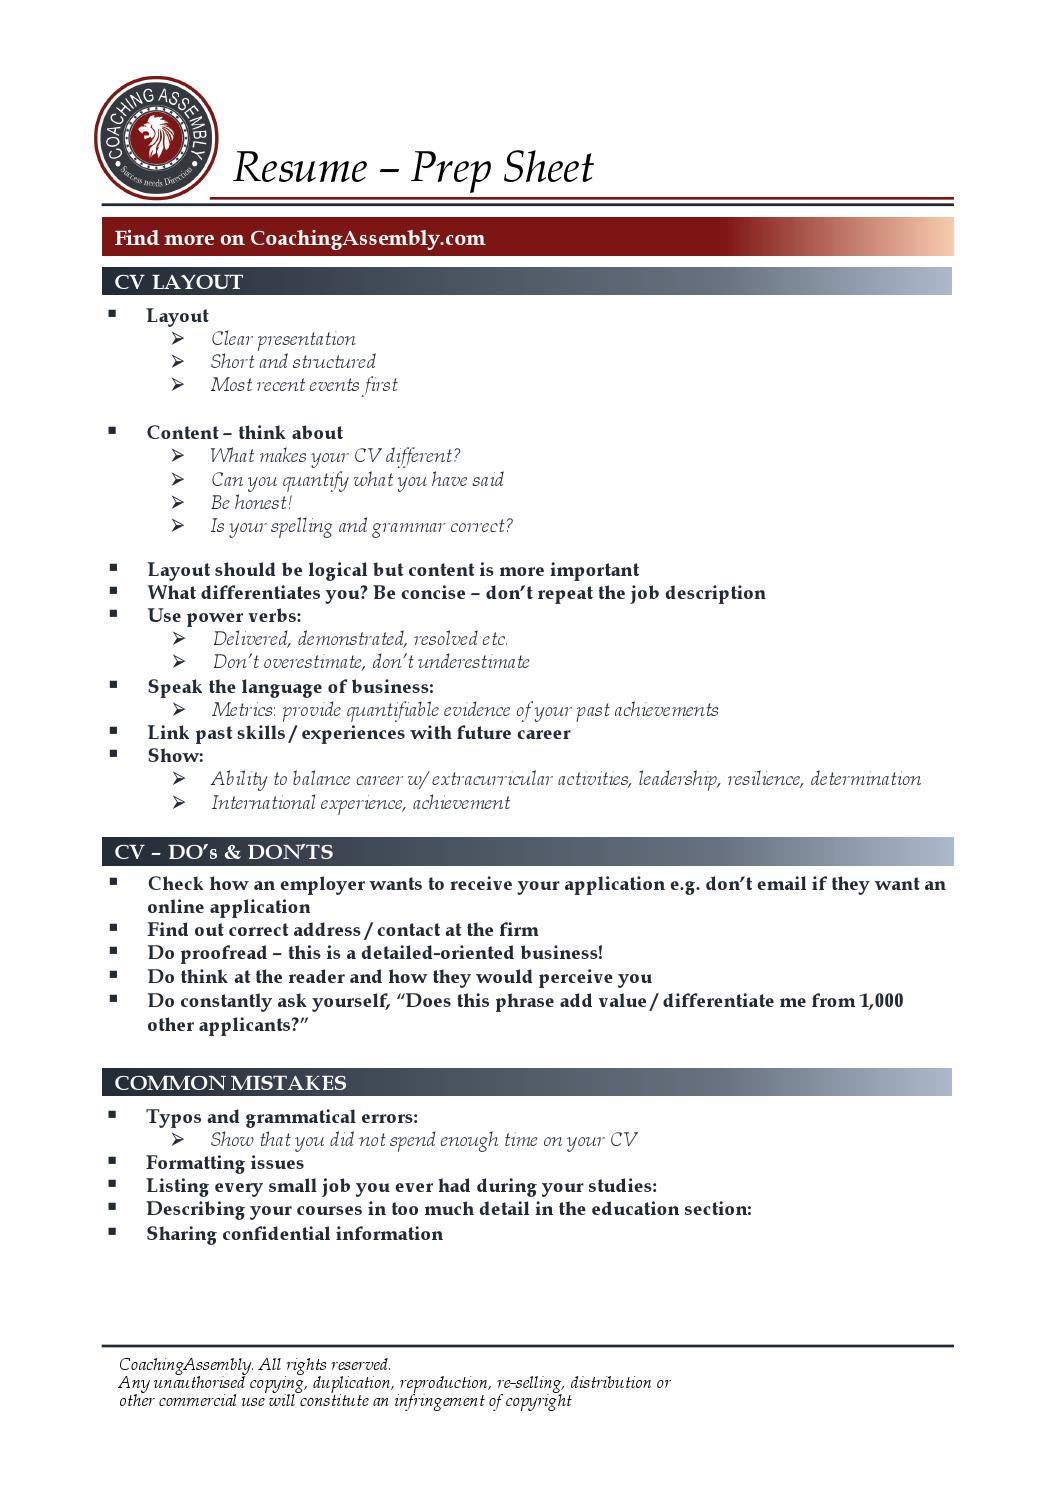 resume cv template coaching assembly resume preparation sheet